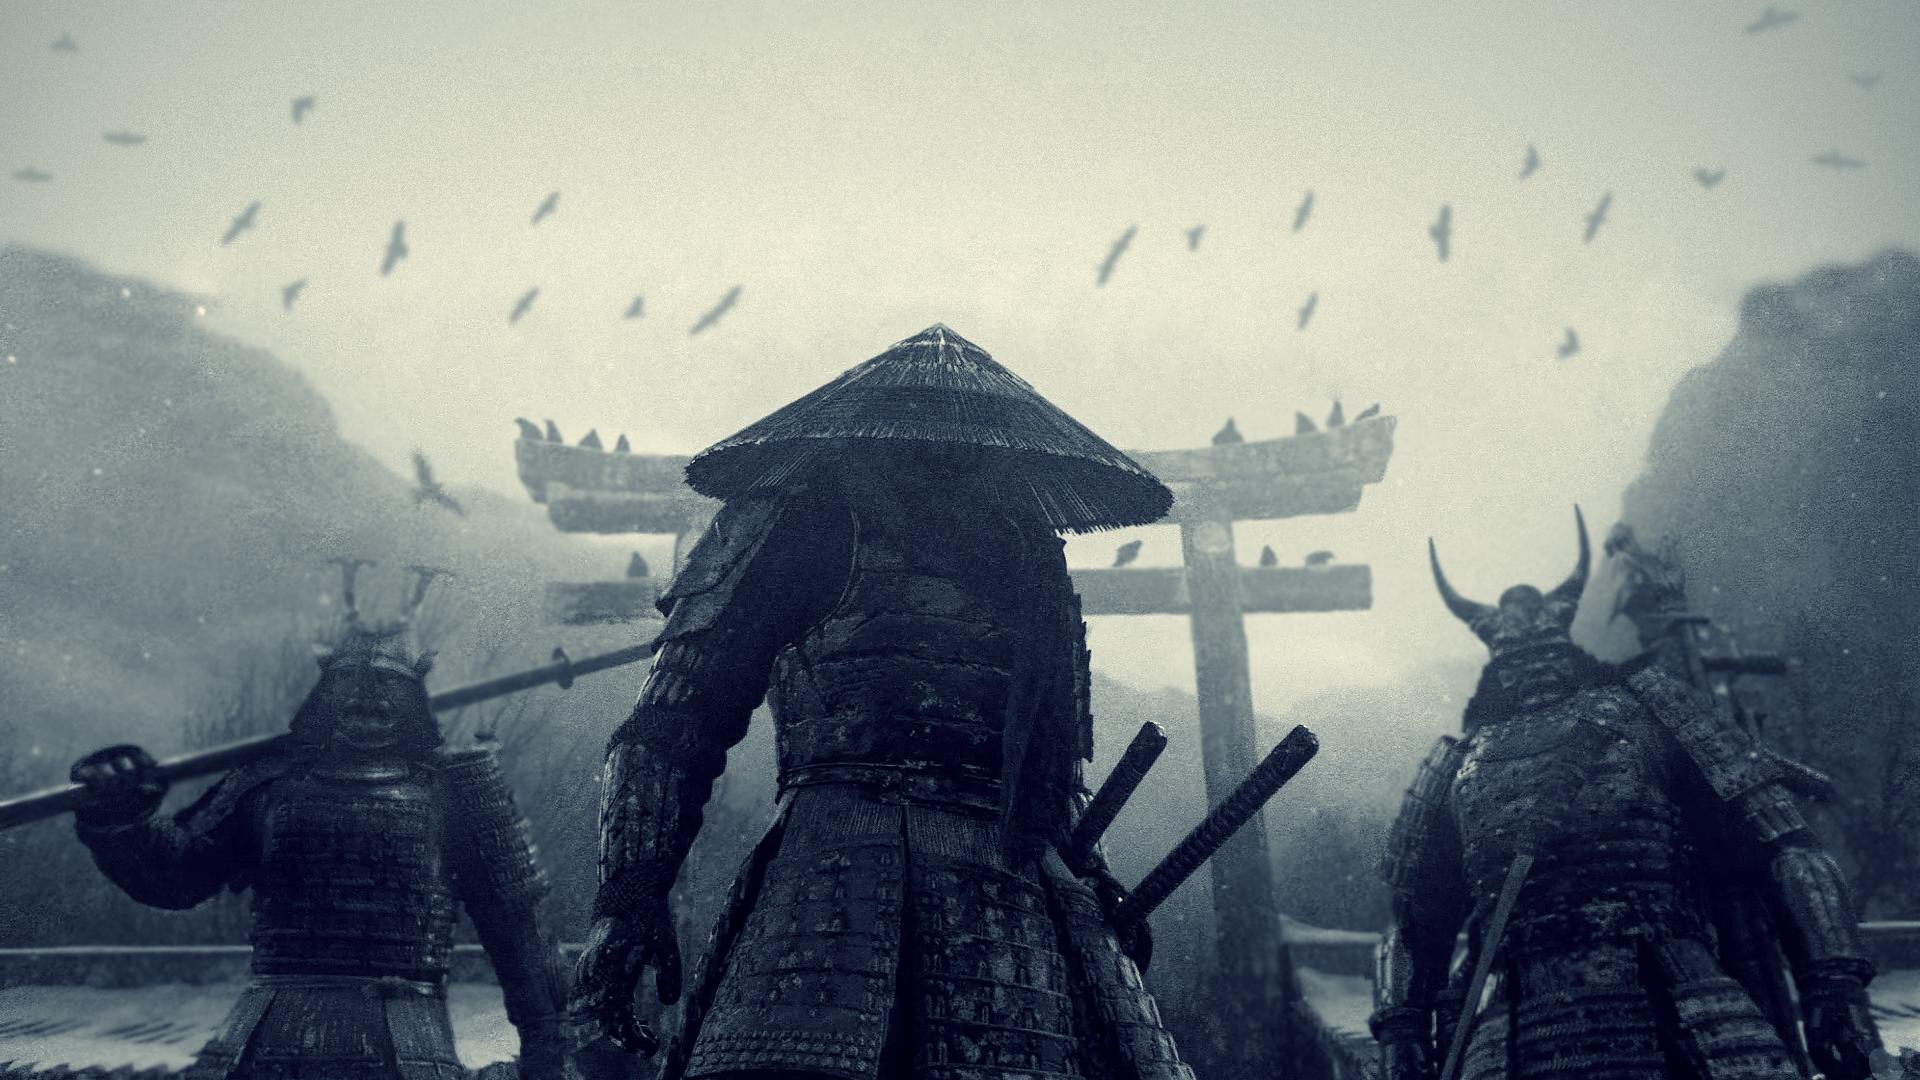 SAMURAI Samurai Samurai Tattoo and Samurai Armor 1920x1080